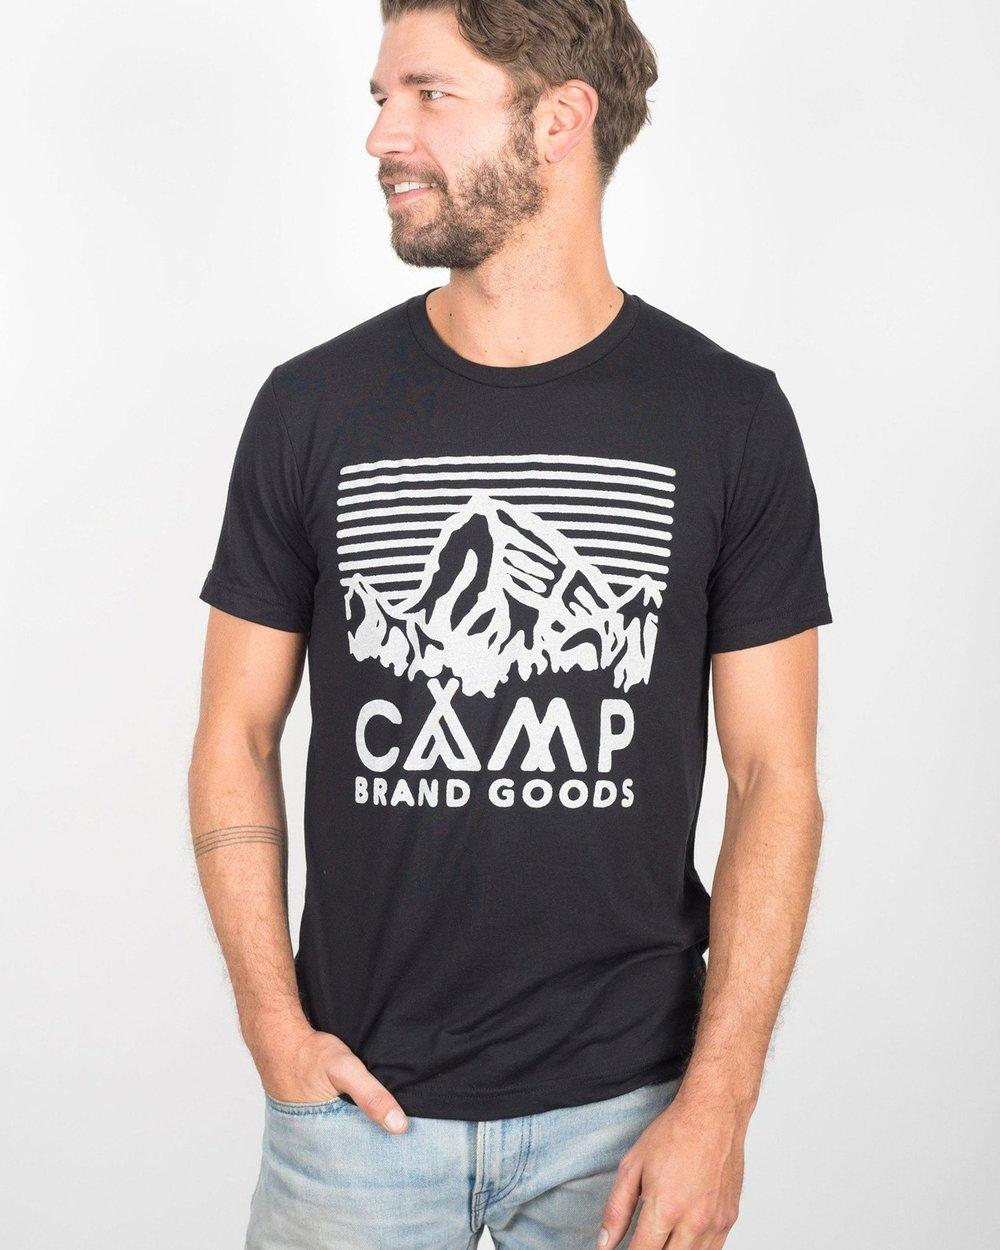 Camp Brand Goods   ,  Heritage Logo T-Shirt , Black, $40.00